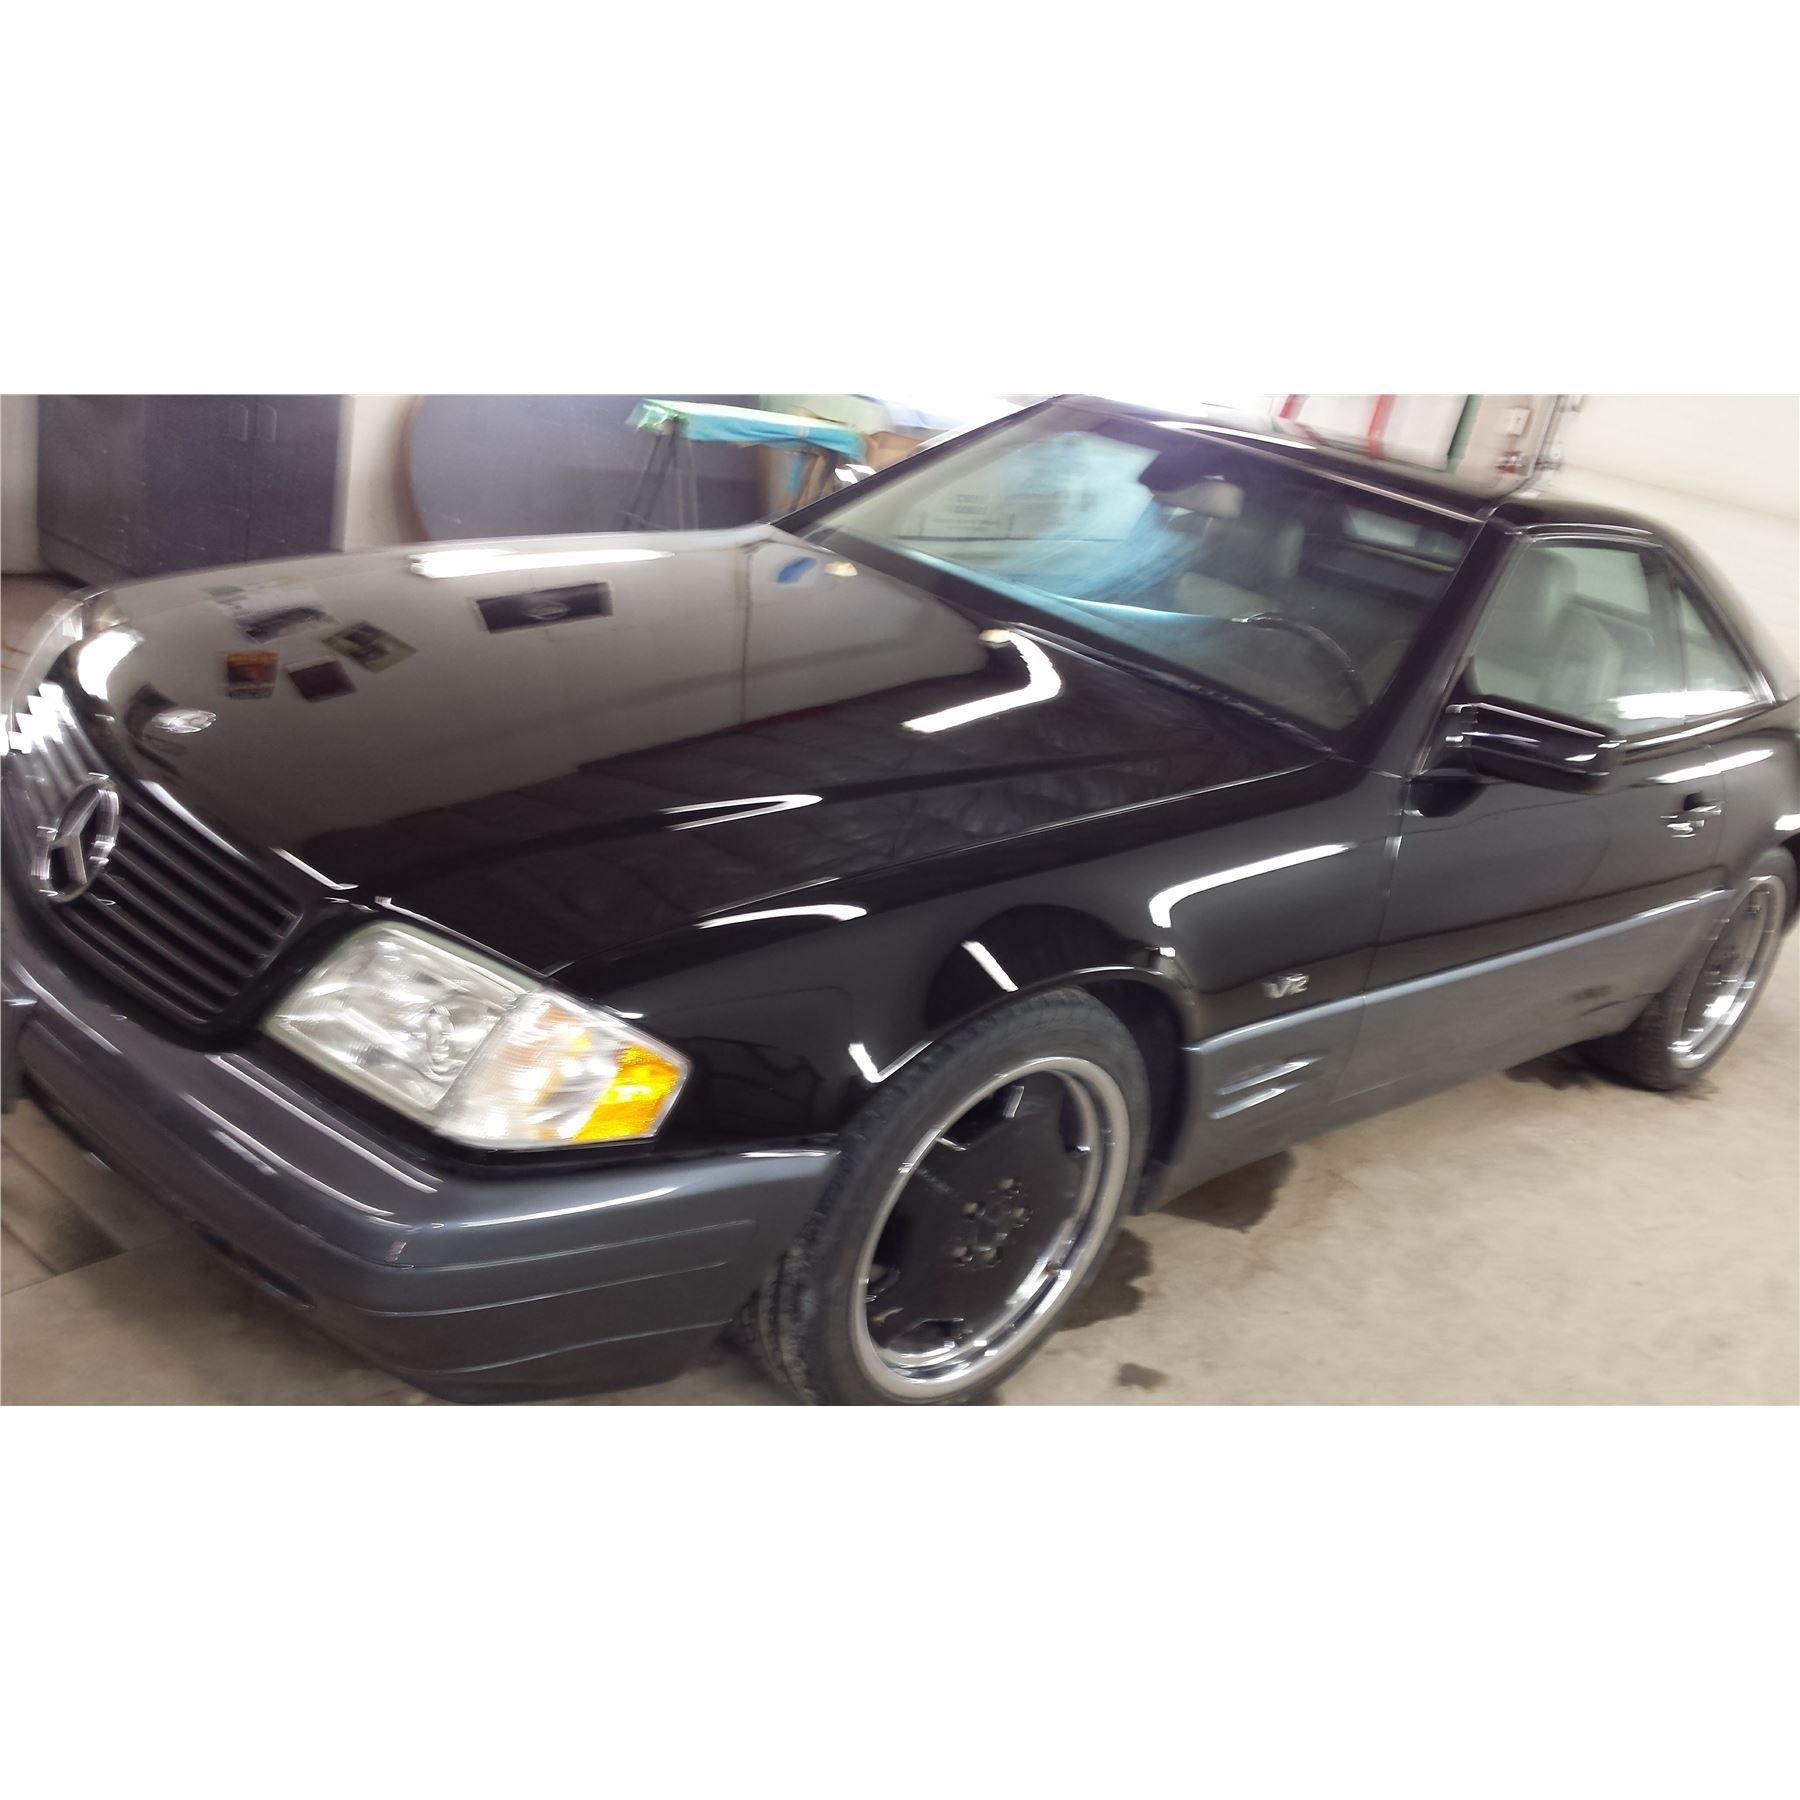 1997 MERCEDES BENZ SL 600 CONVERTIBLE - The Electric Garage